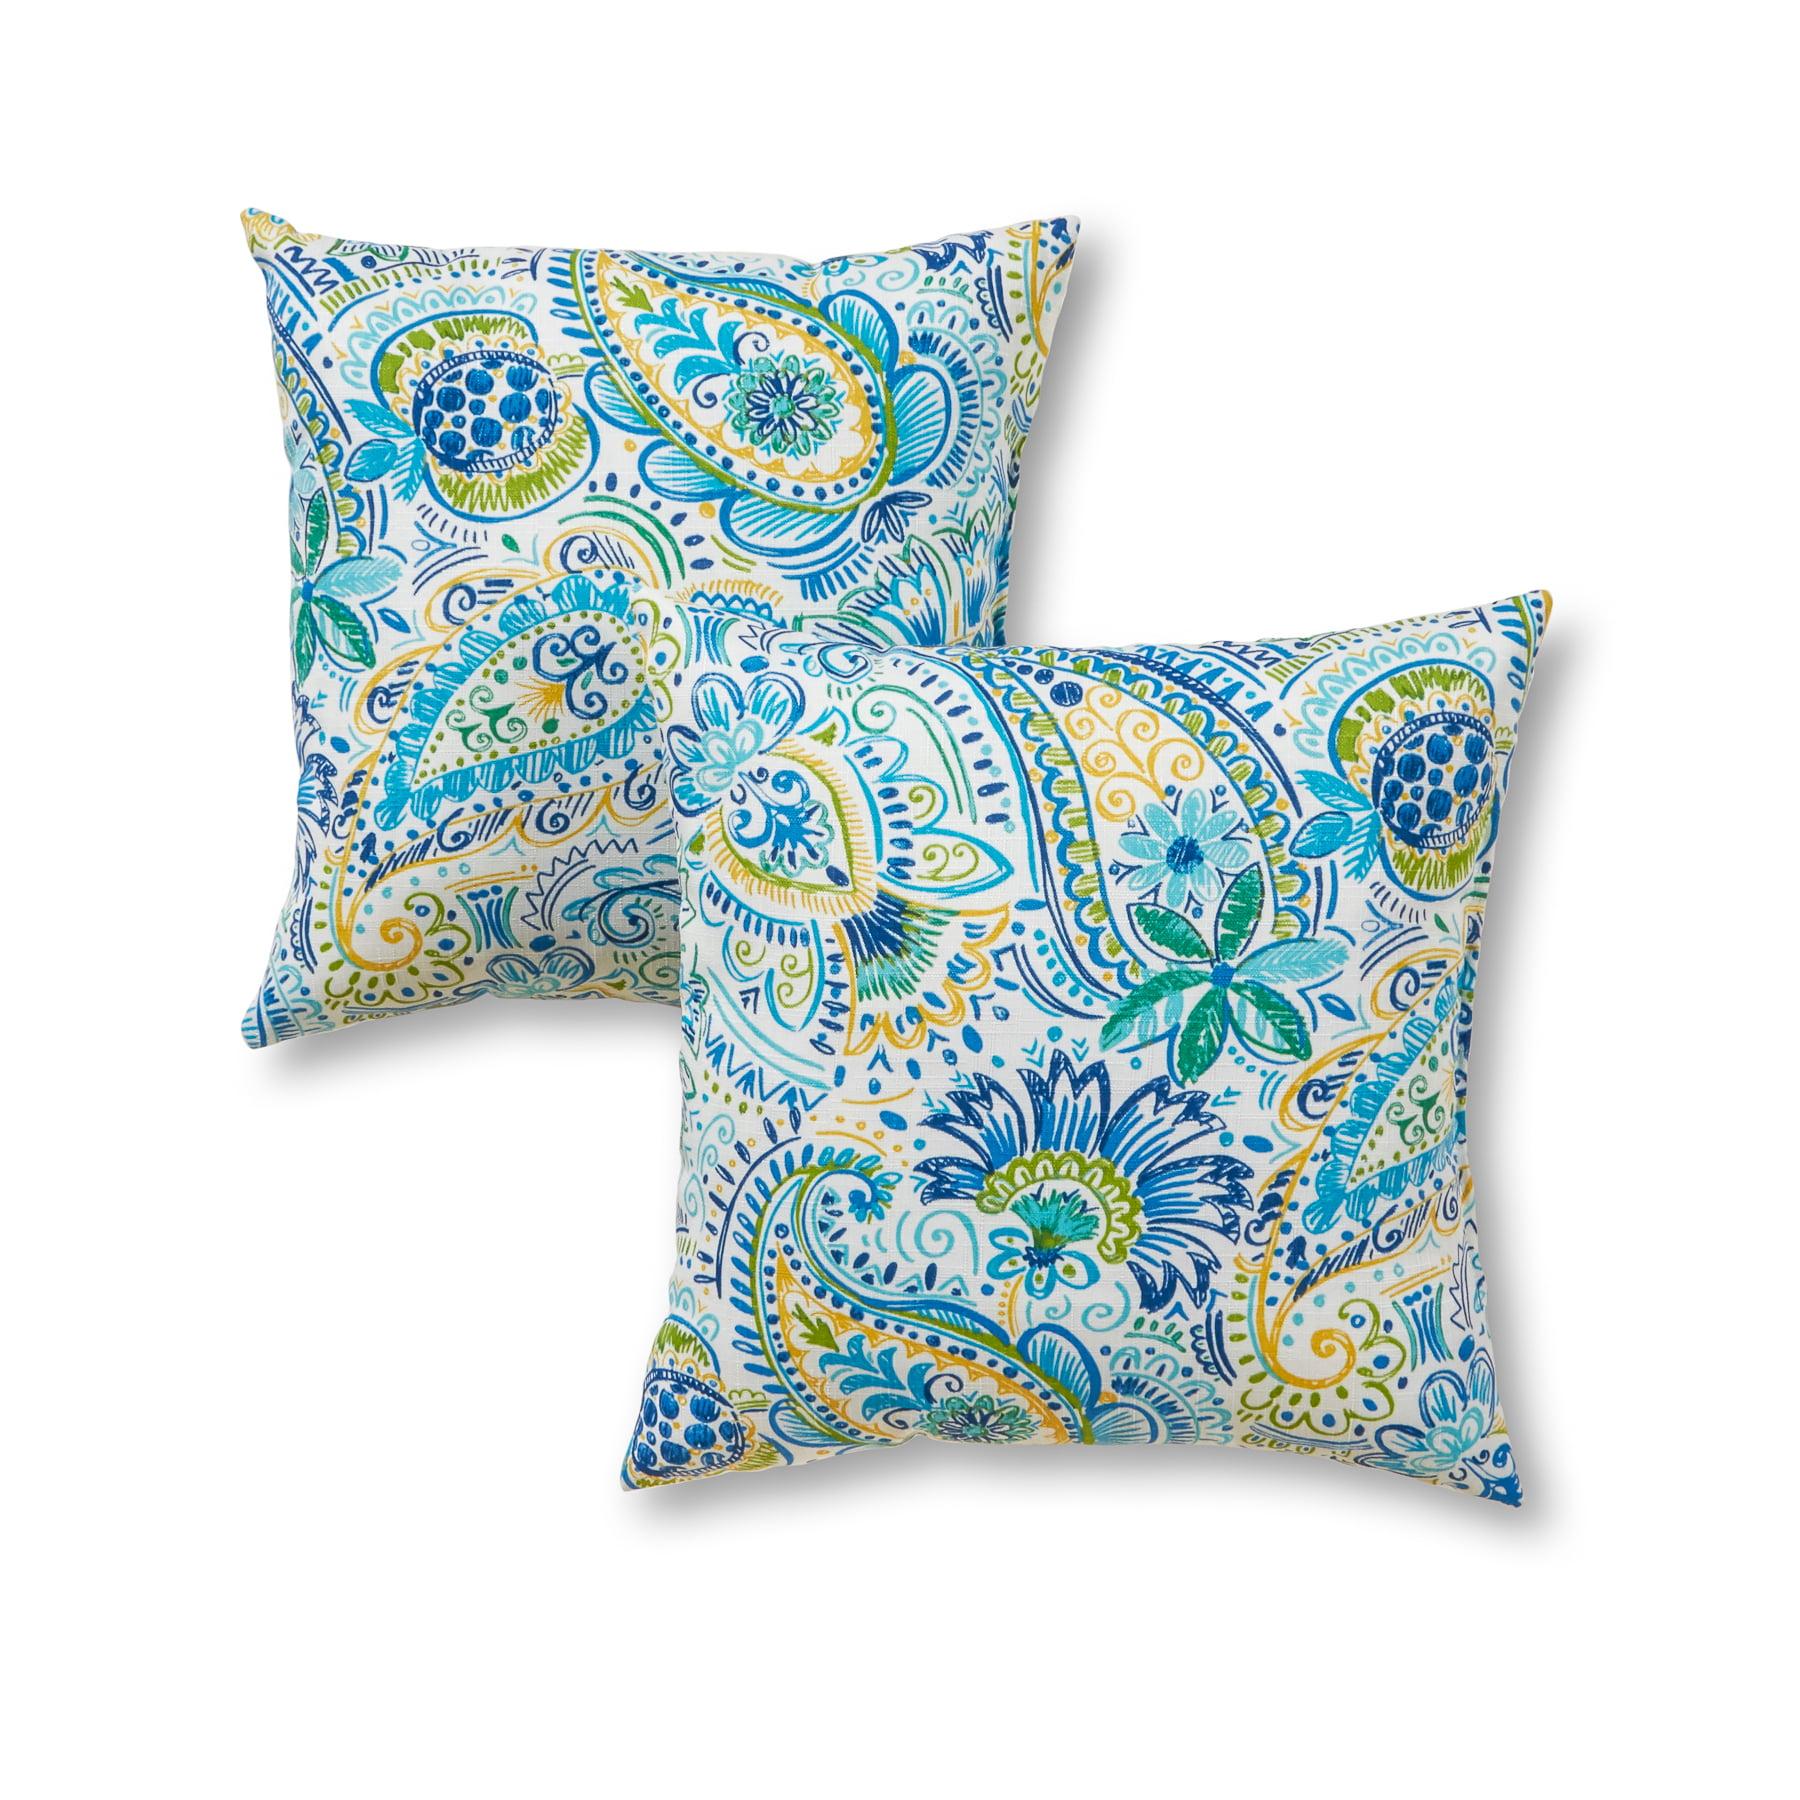 Orange 17 Square Throw Pillows /& 12 x 20 Rectangle // Lumbar Decorative Throw Pillows Set of 4 Indoor // Outdoor Pillows Blue Yellow Pink Bright Artistic Floral